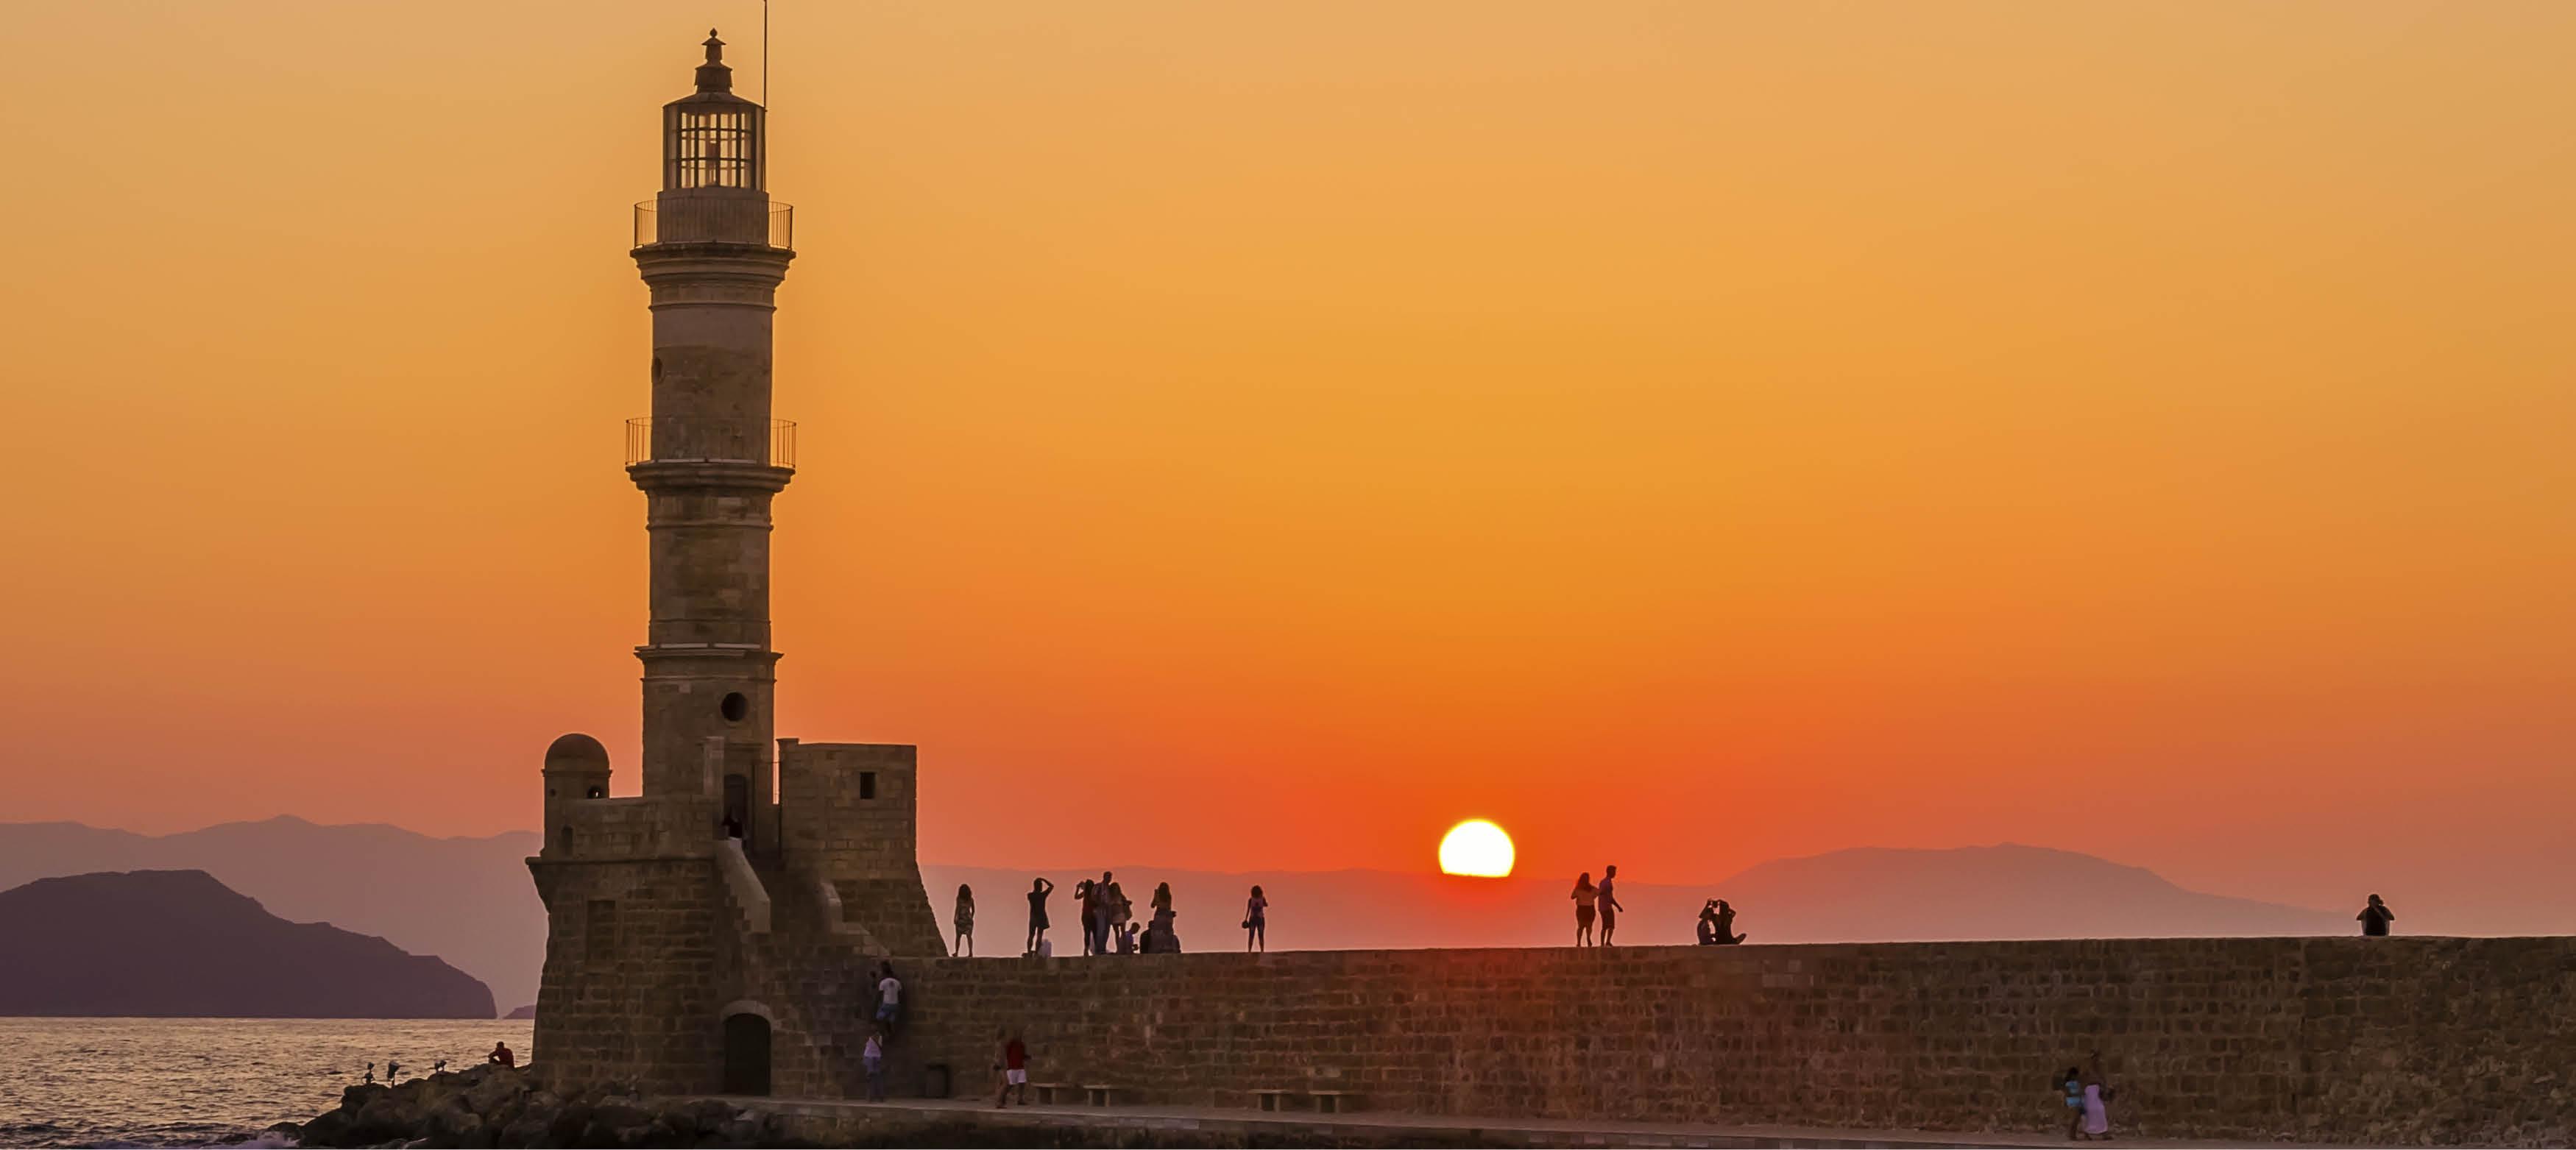 Fyrtårnet i Chania på Kreta